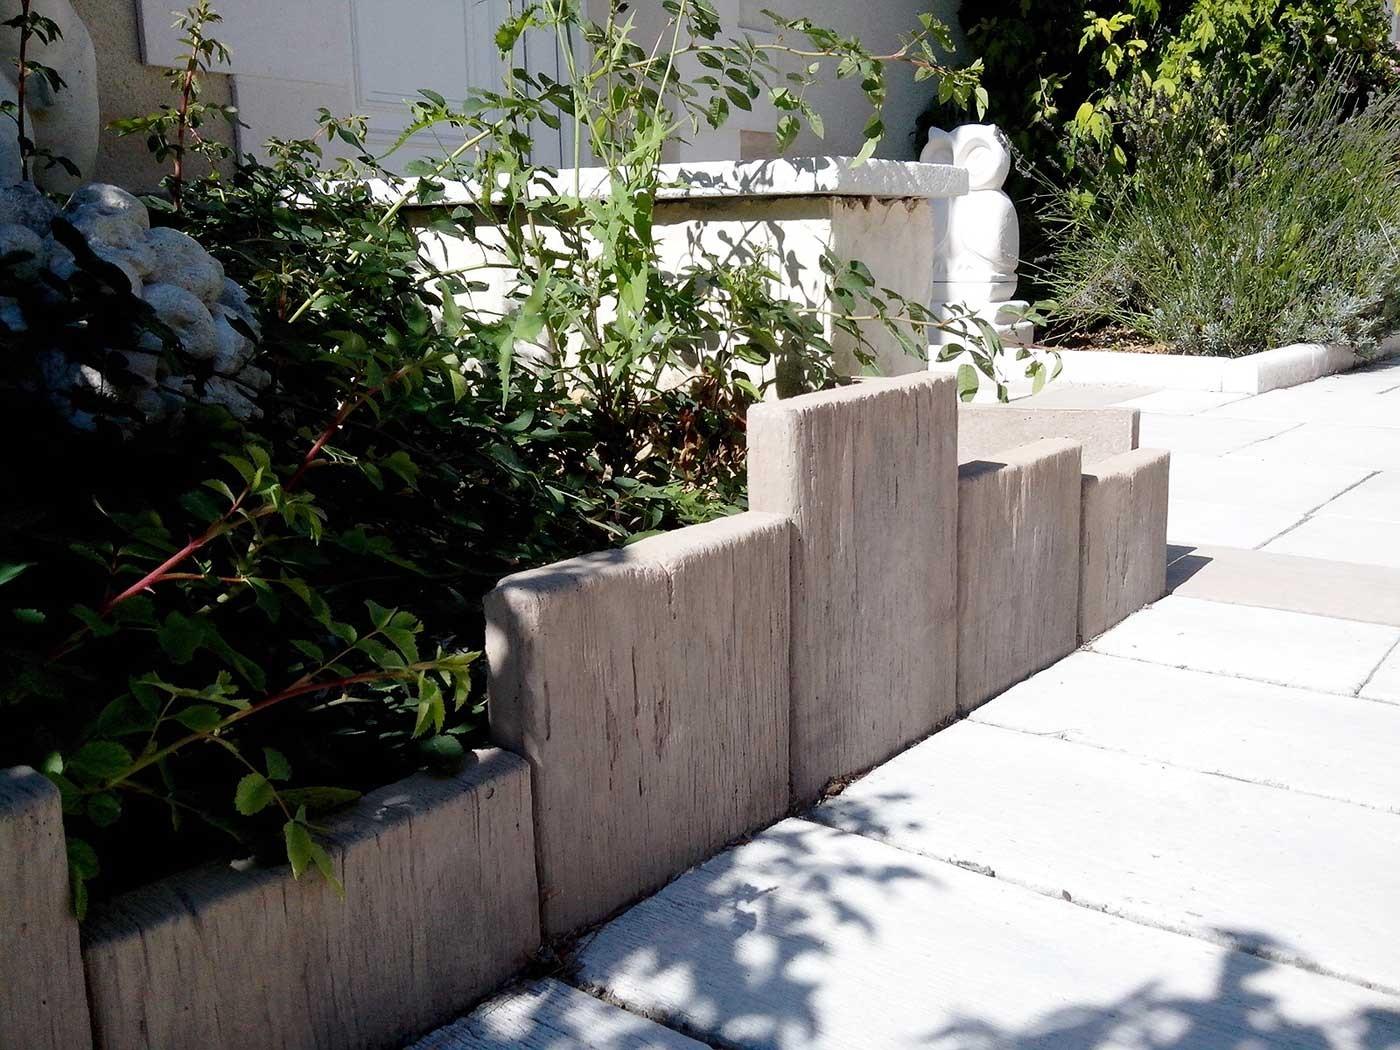 bordure de jardin en pierre reconstitu e planche apparence. Black Bedroom Furniture Sets. Home Design Ideas